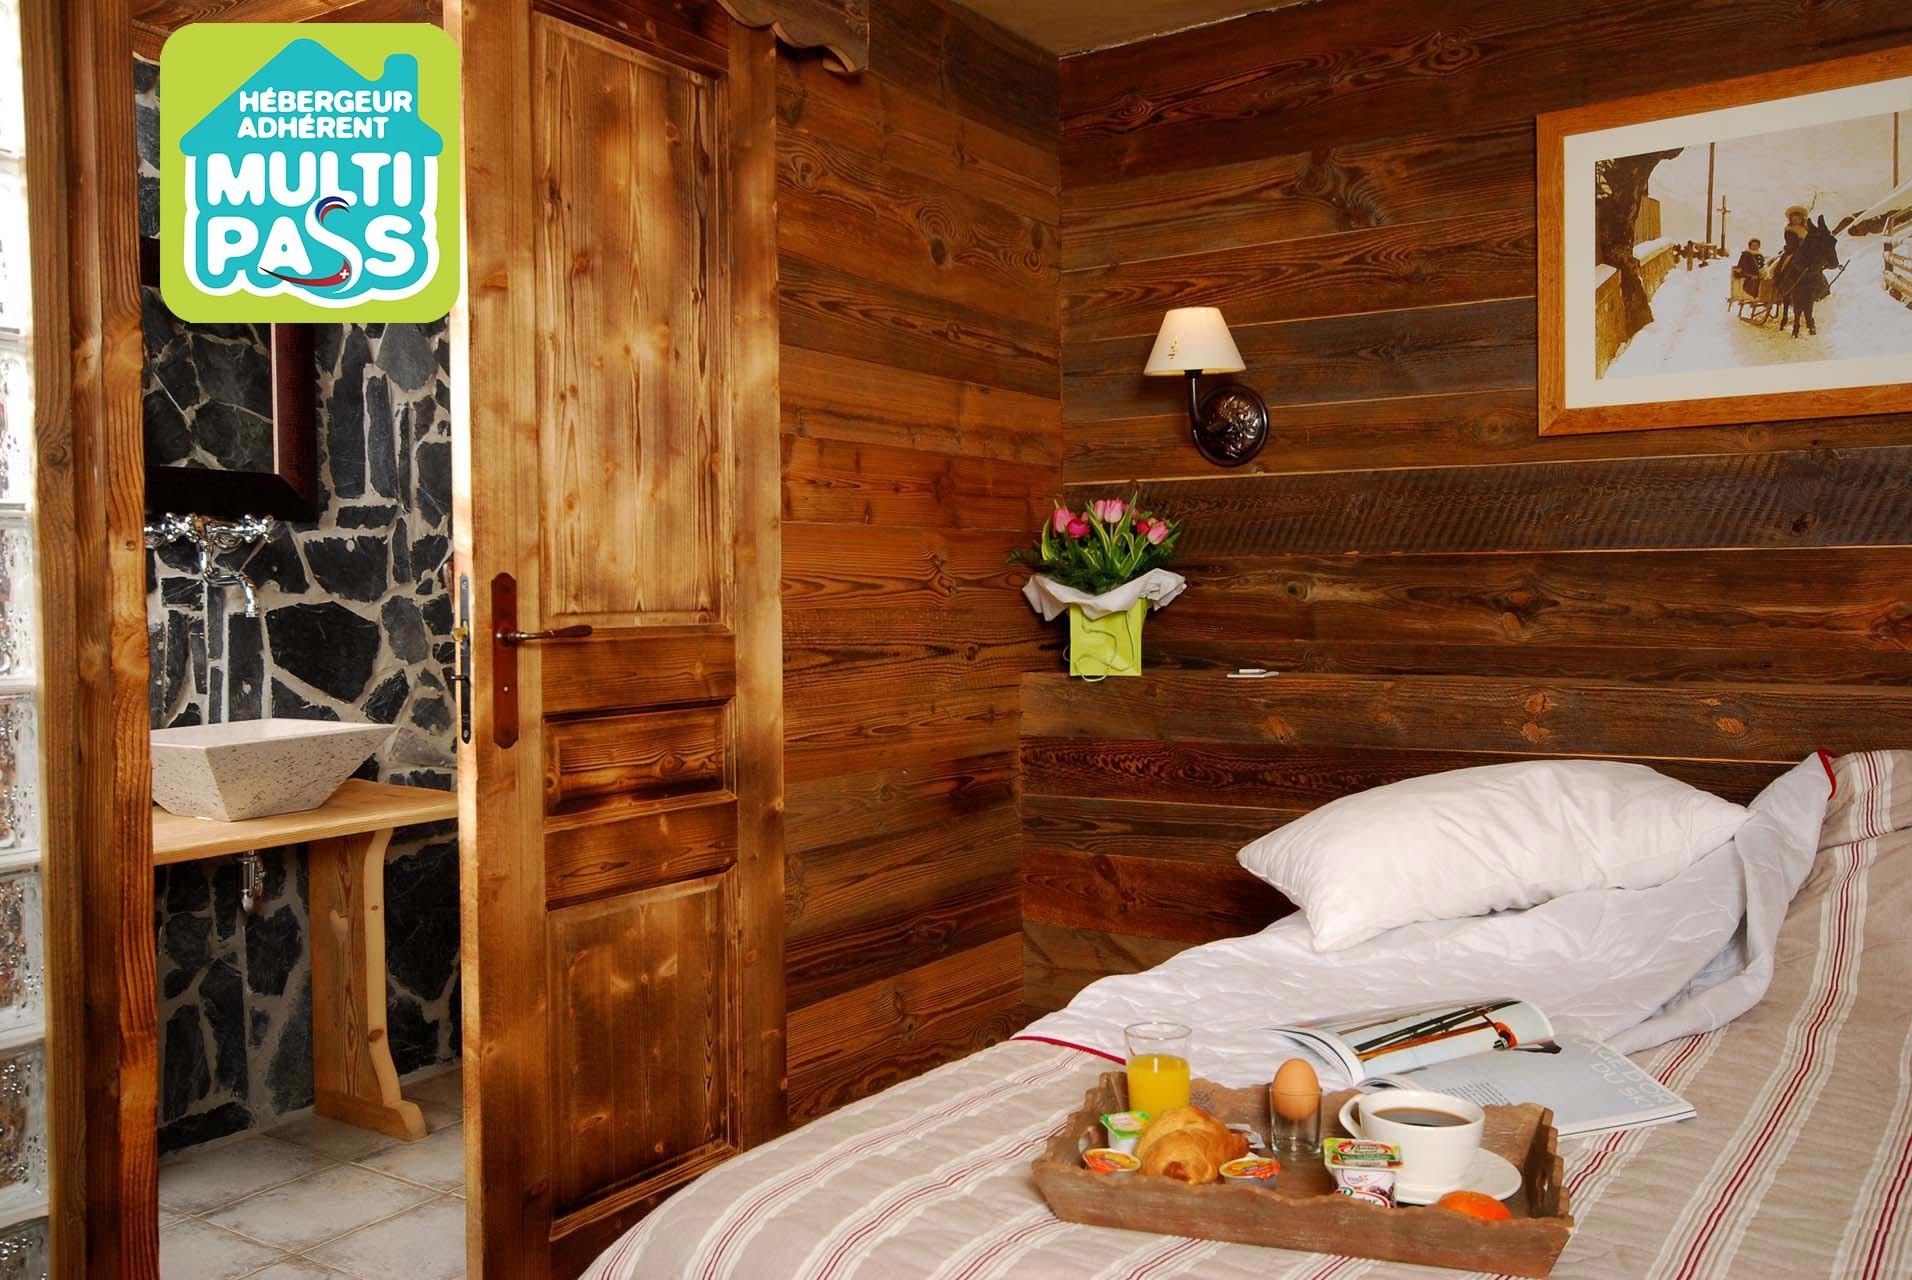 Hotels & holiday residences